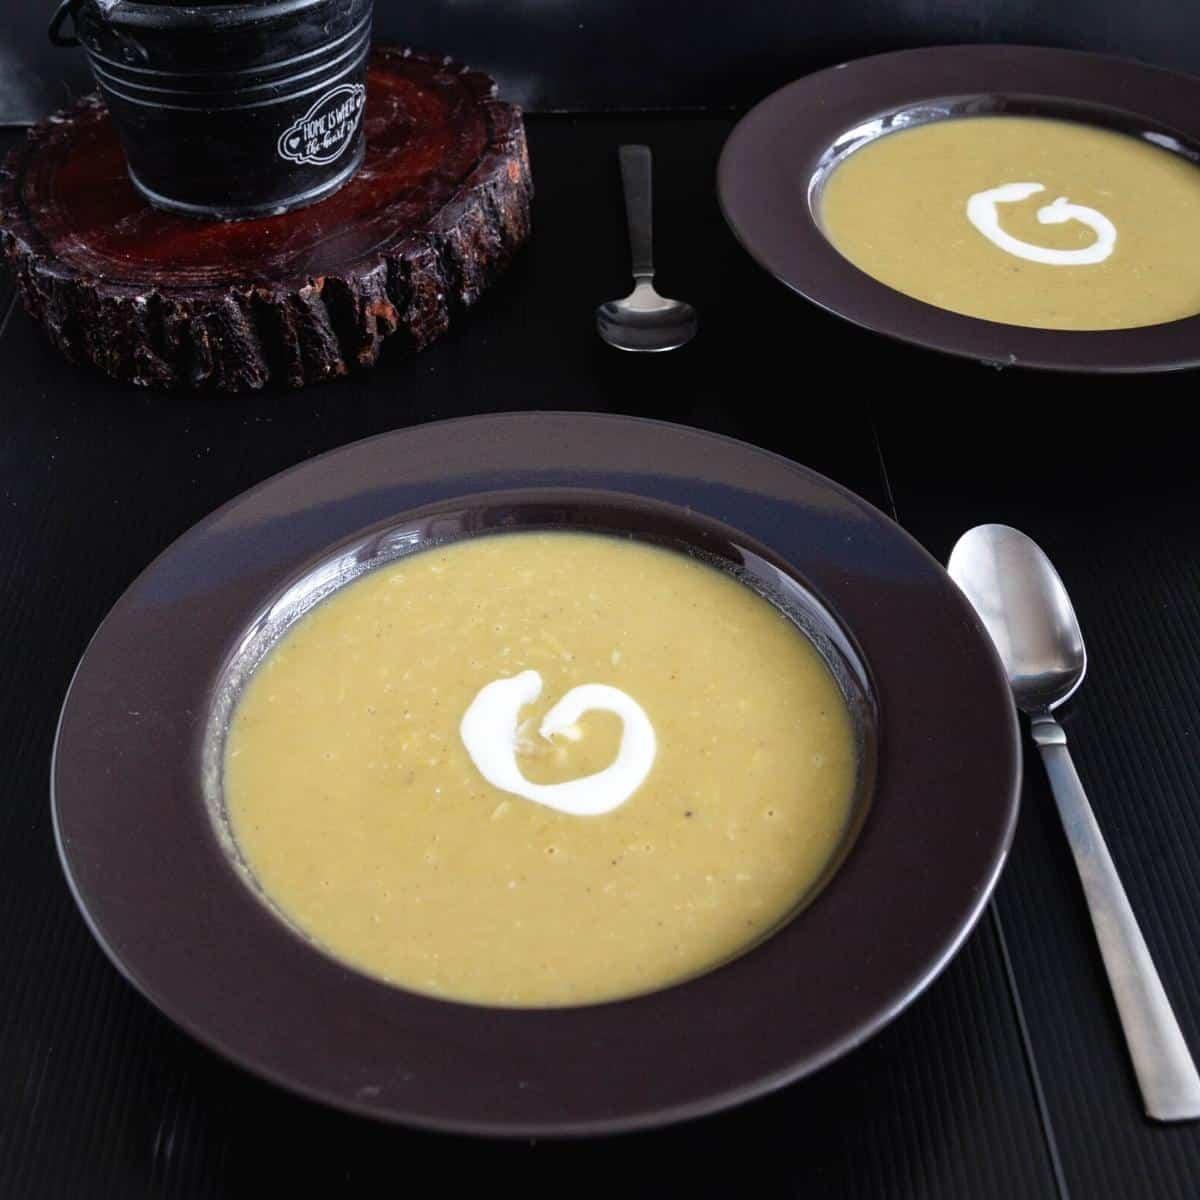 Bowl of soup with split pea soup.